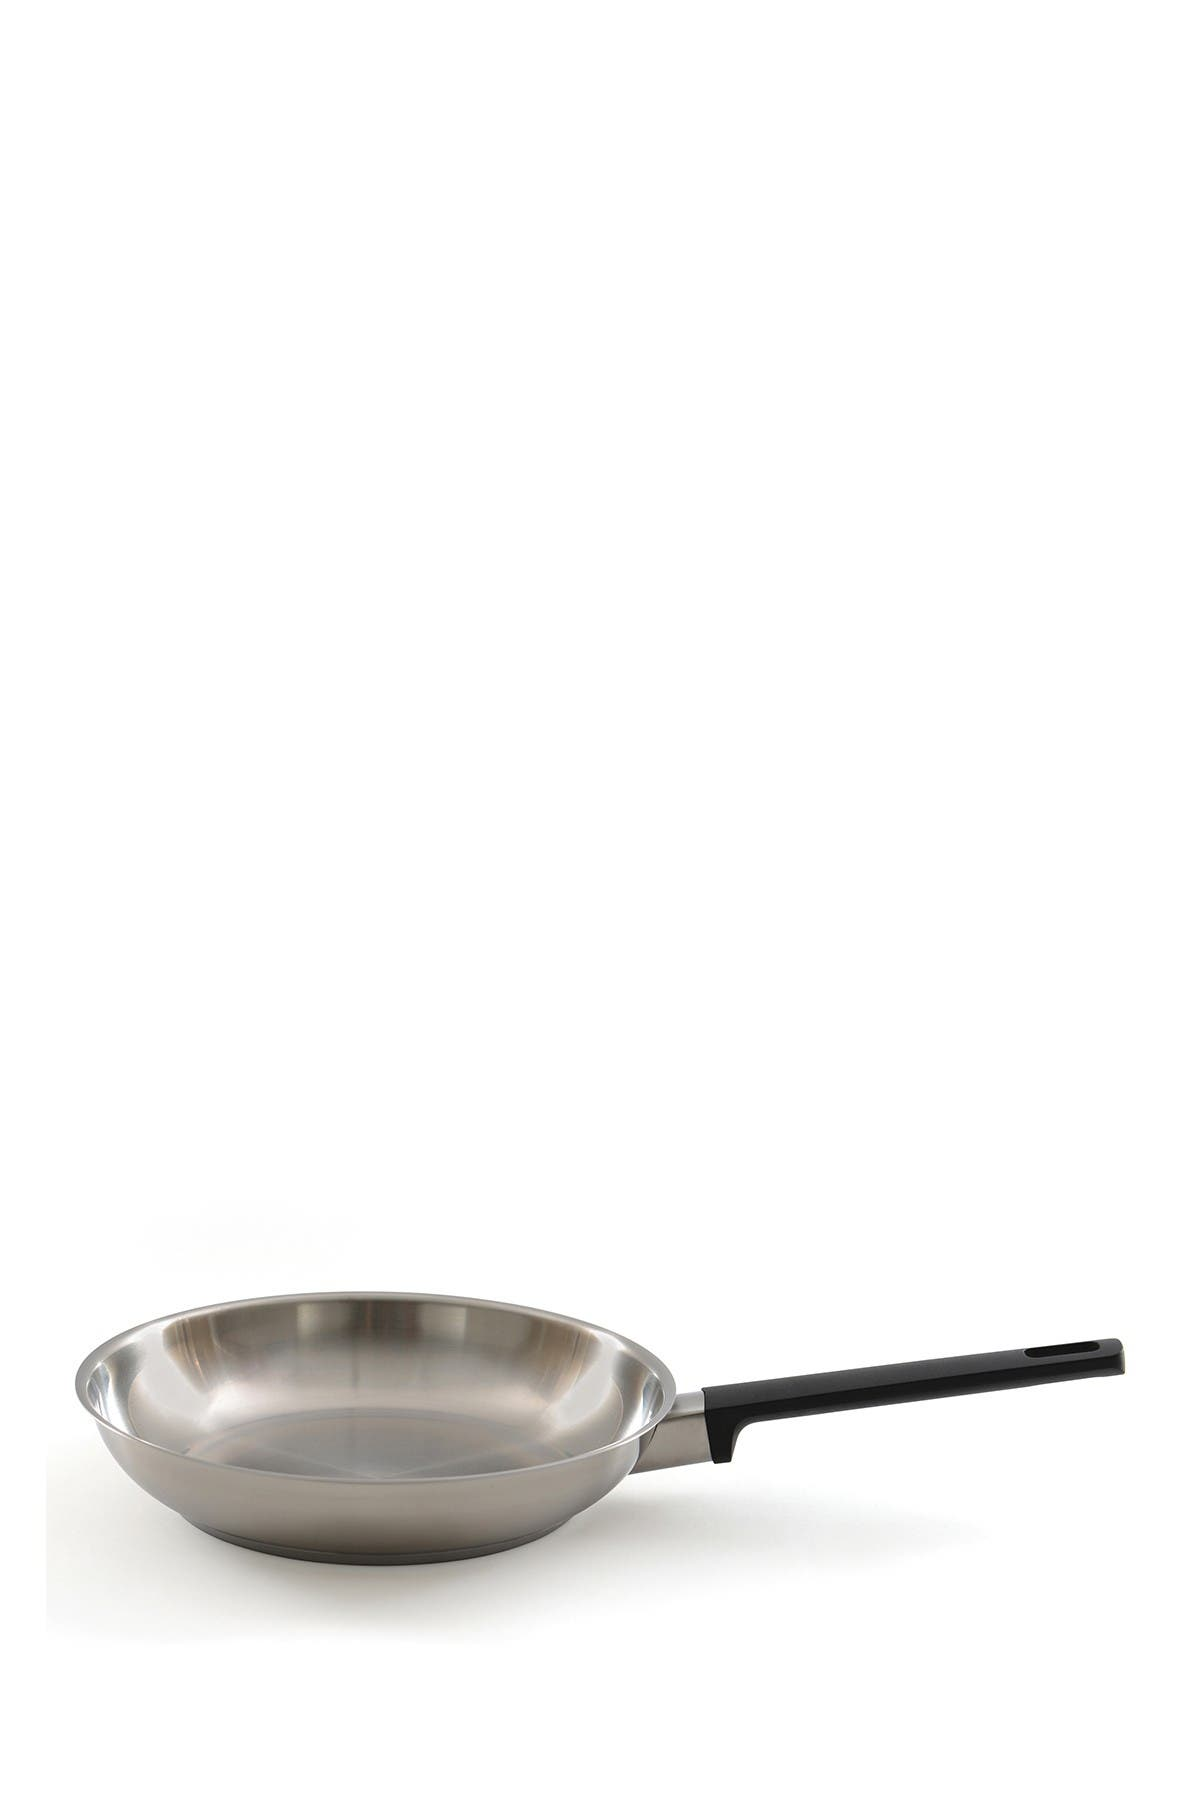 "Image of BergHOFF Silver/Black Ron 10"" Fry Pan"